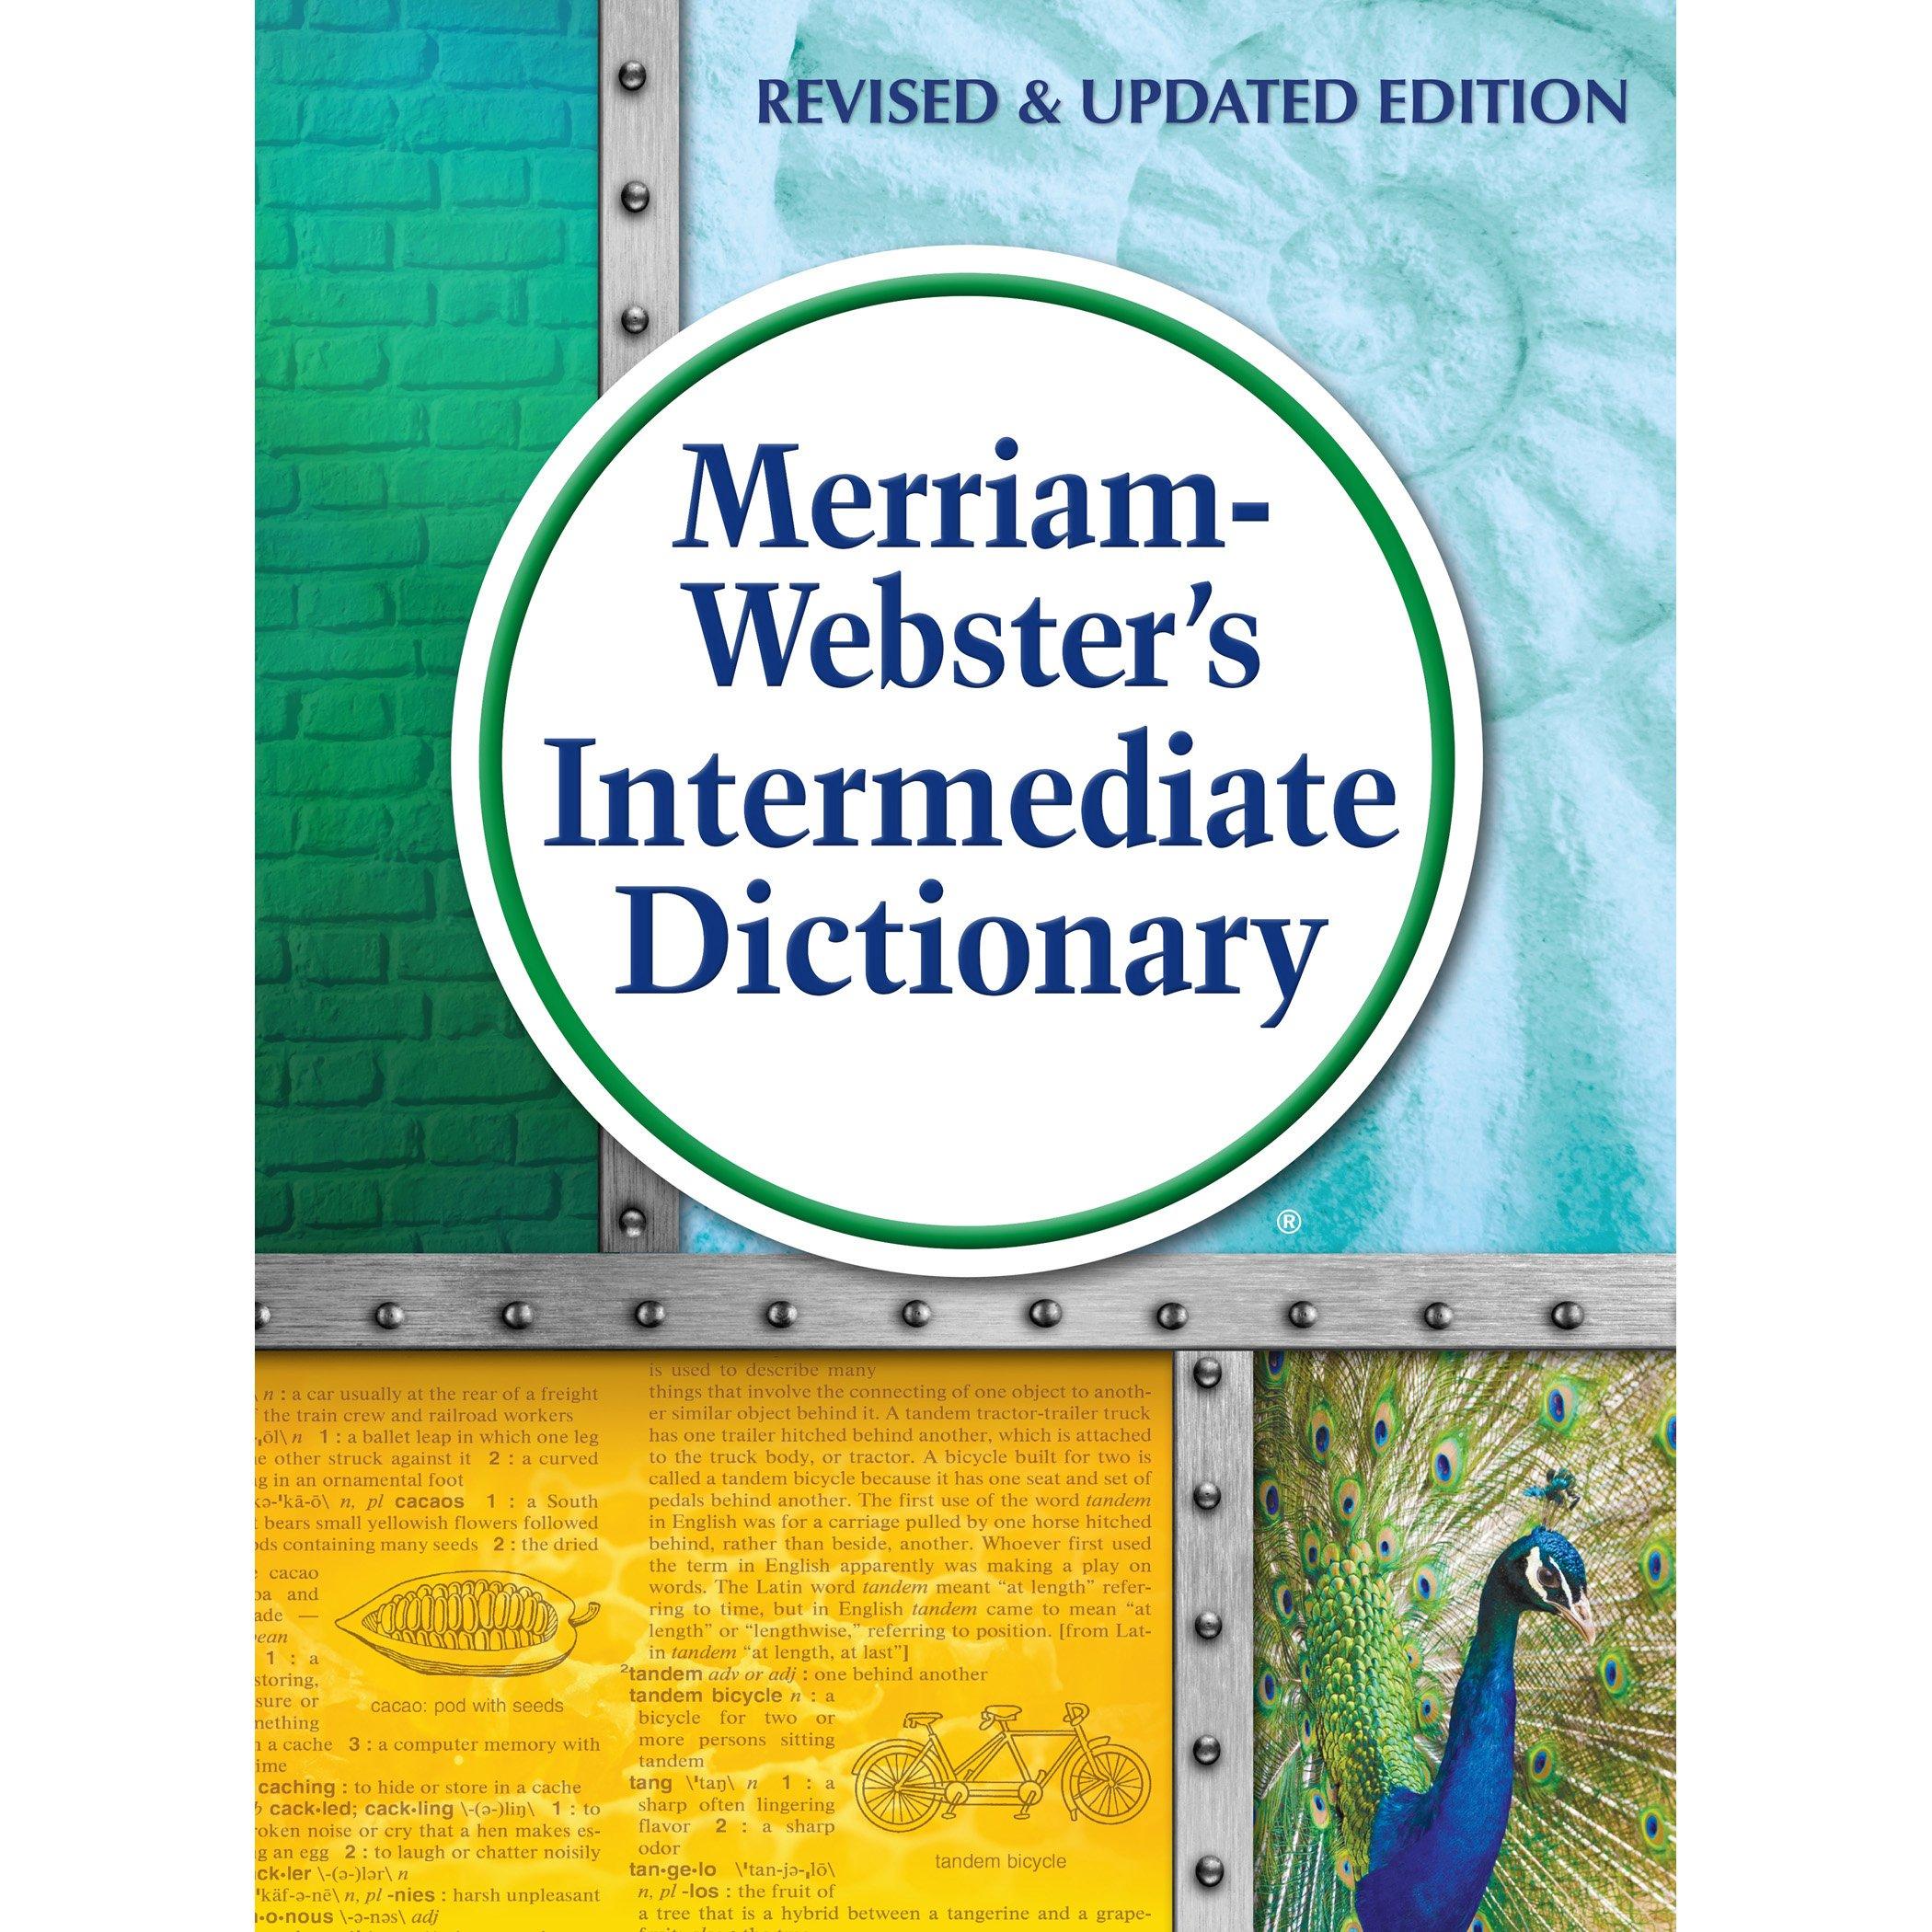 Amazon.com: Merriam-Webster's Intermediate Dictionary, New Edition, 2016  copyright (9780877796978): Merriam-Webster, Inc.: Books